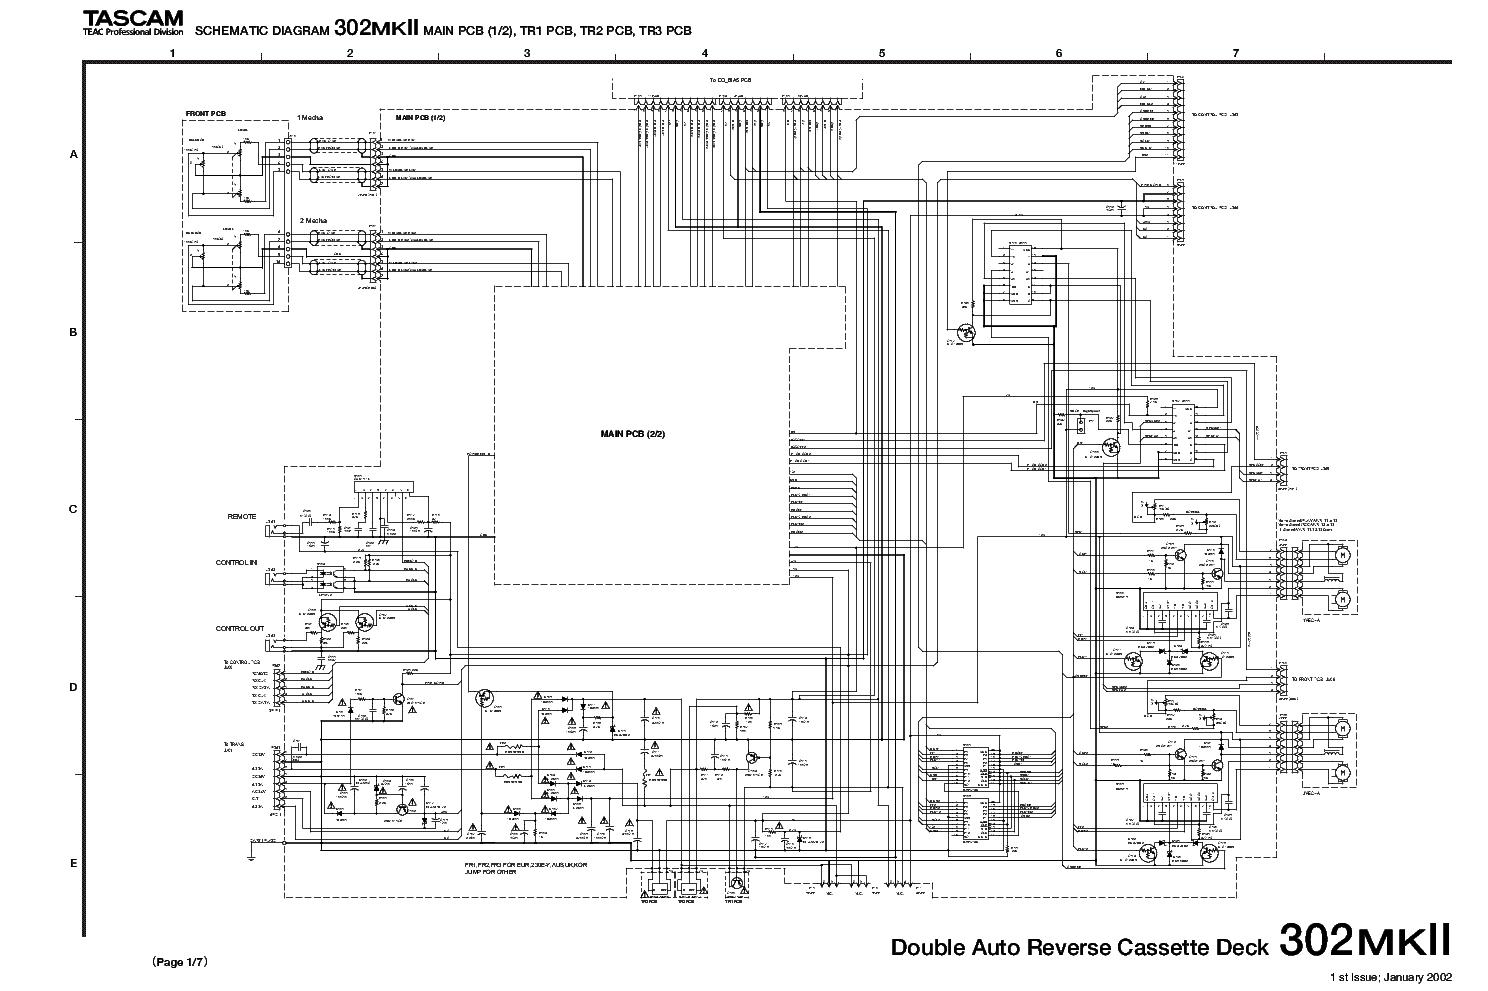 tascam 302mk2 sch service manual download, schematics, eeprom, repair info  for electronics experts  elektrotanya